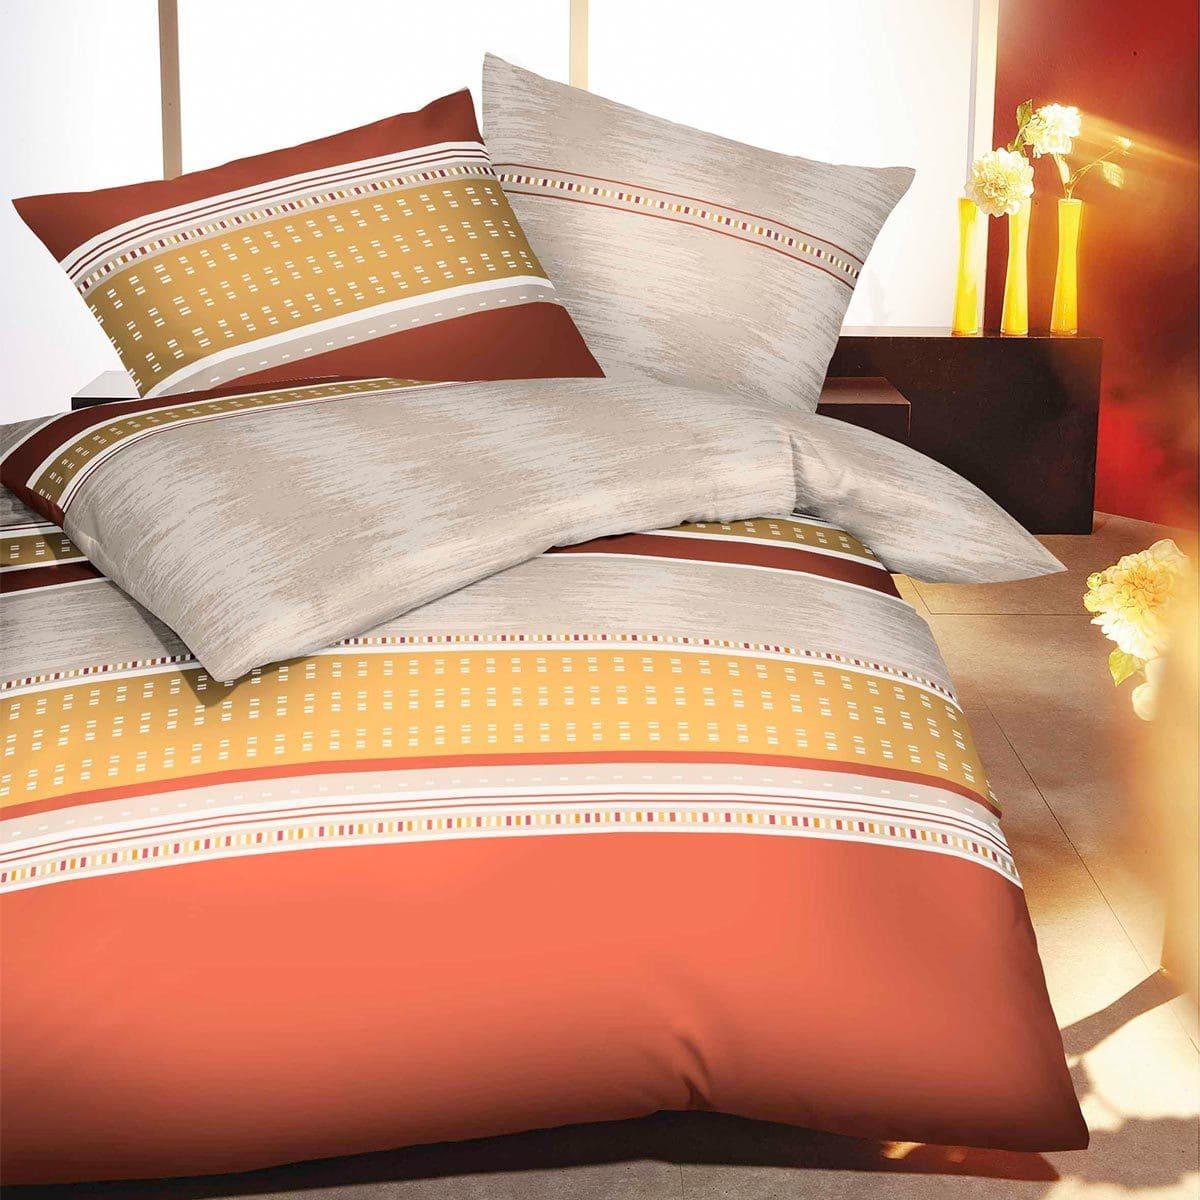 kaeppel biber bettw sche shuttle kupfer g nstig online kaufen bei bettwaren shop. Black Bedroom Furniture Sets. Home Design Ideas